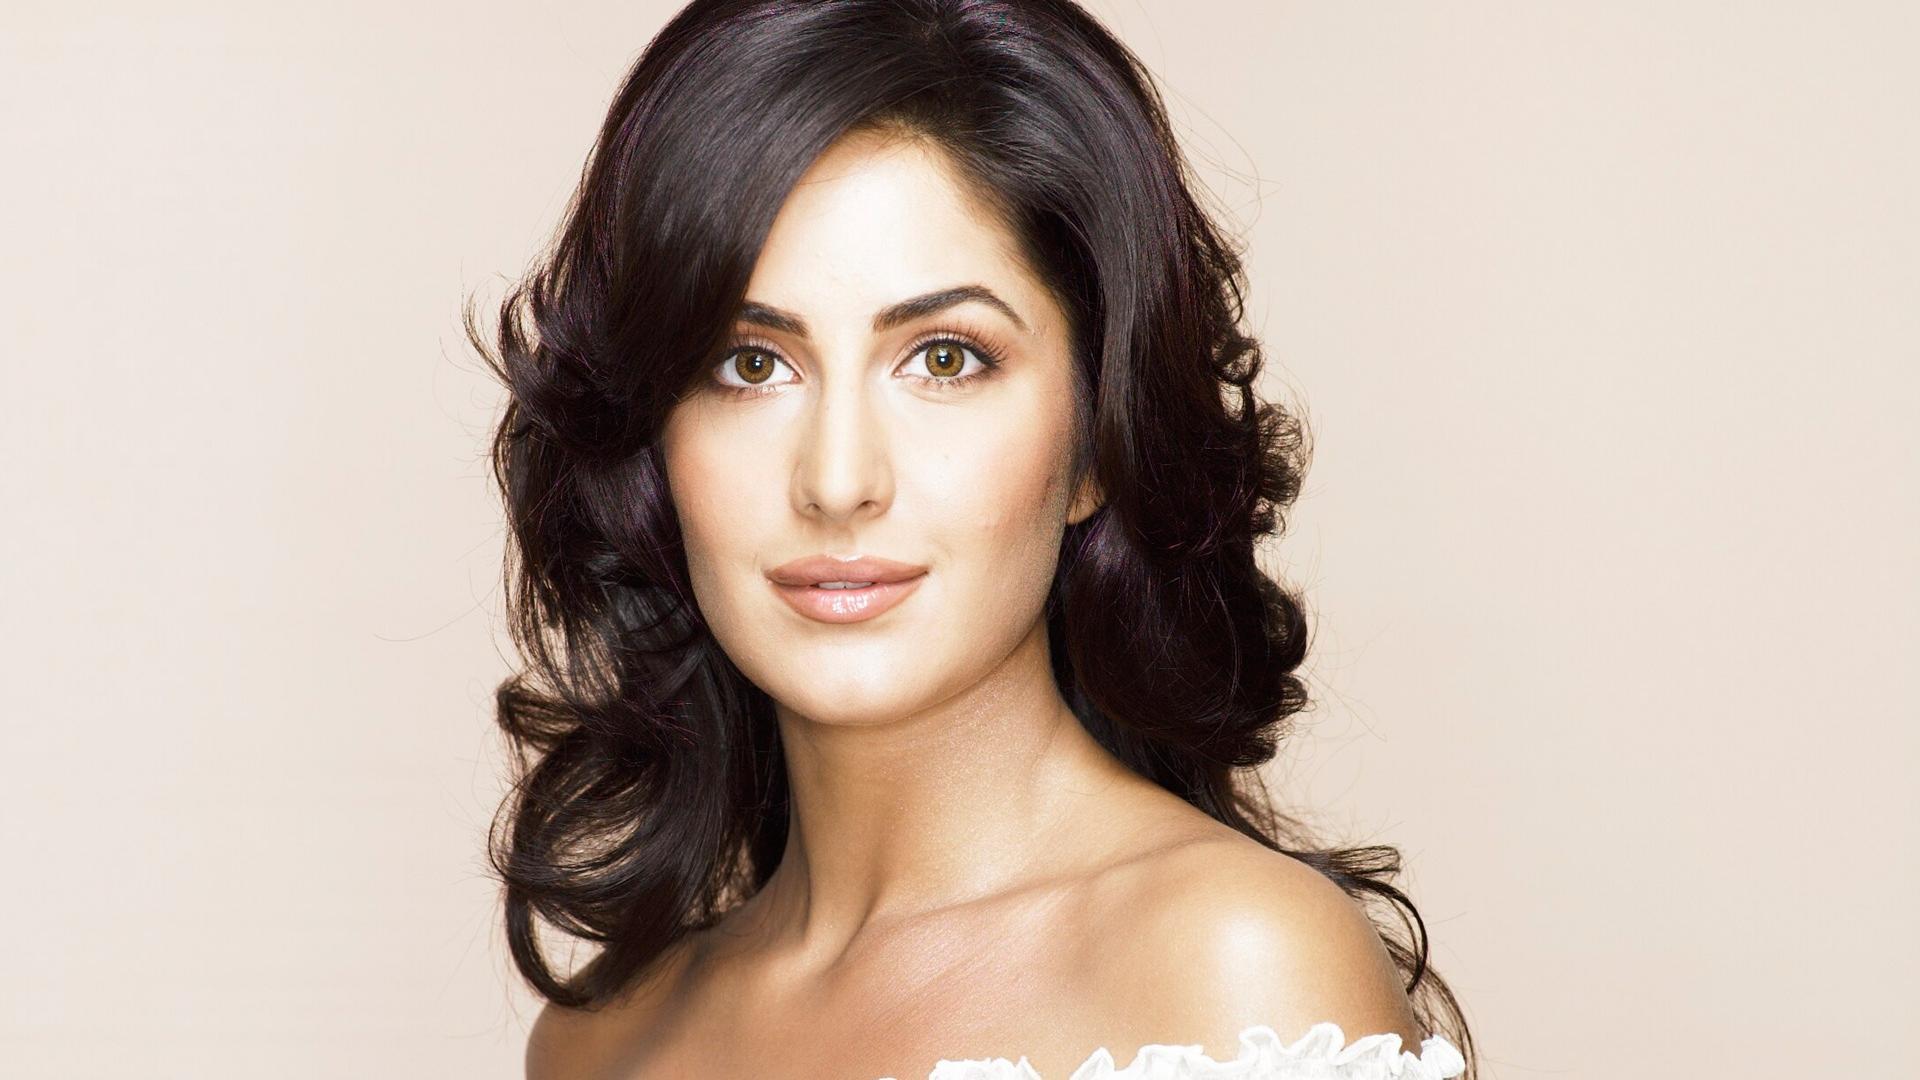 Beauty Picture Memories Katrina Kaif Hd Wallpapers